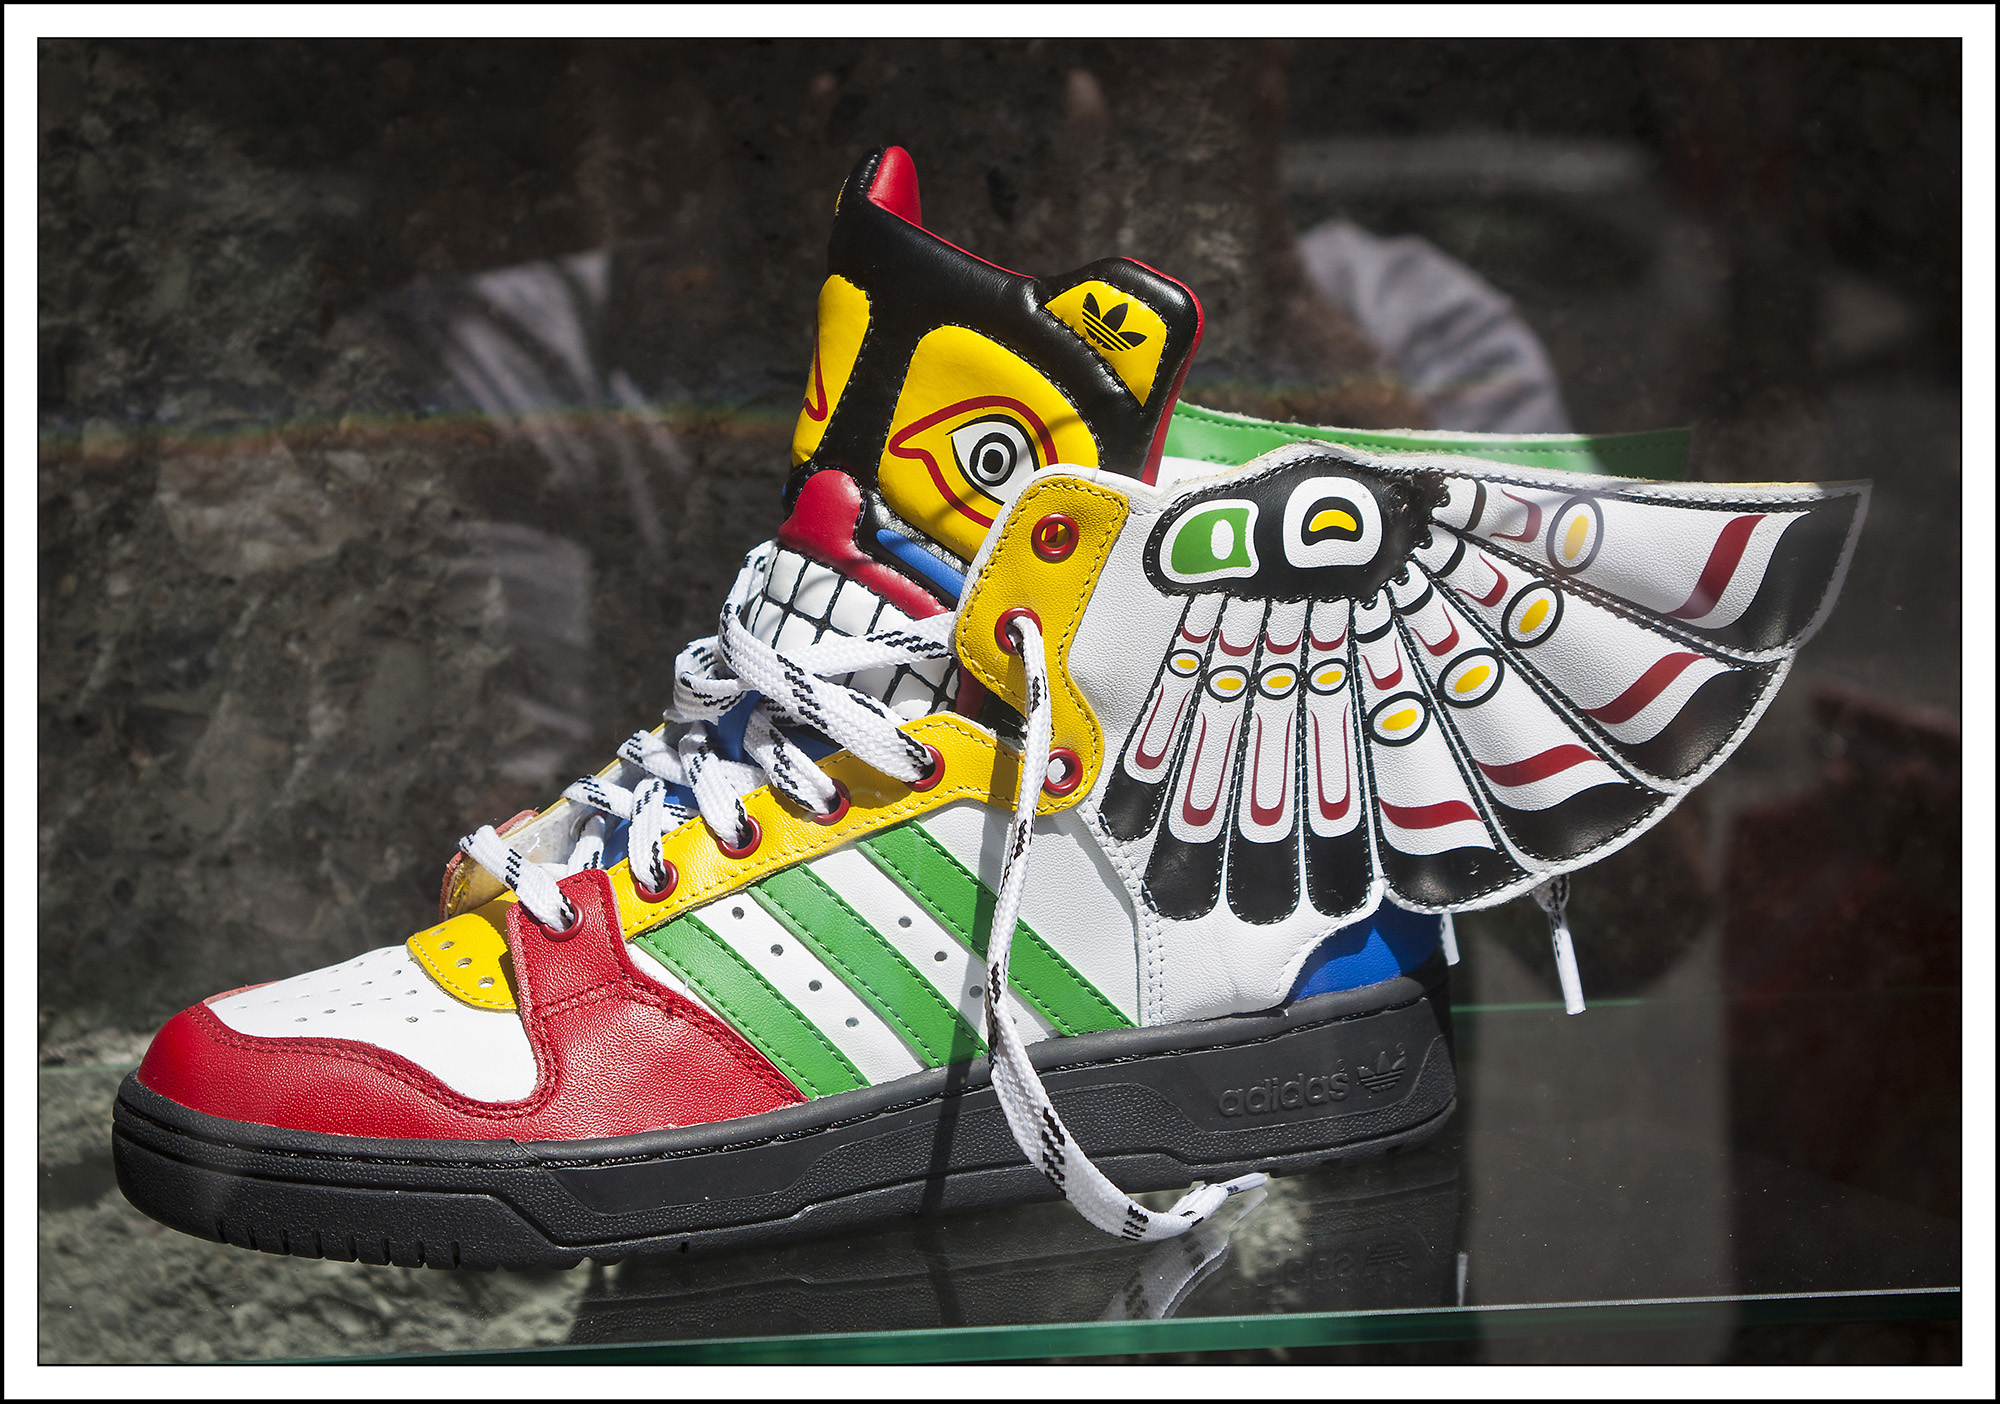 Robert Zrnec_Adidas in krila